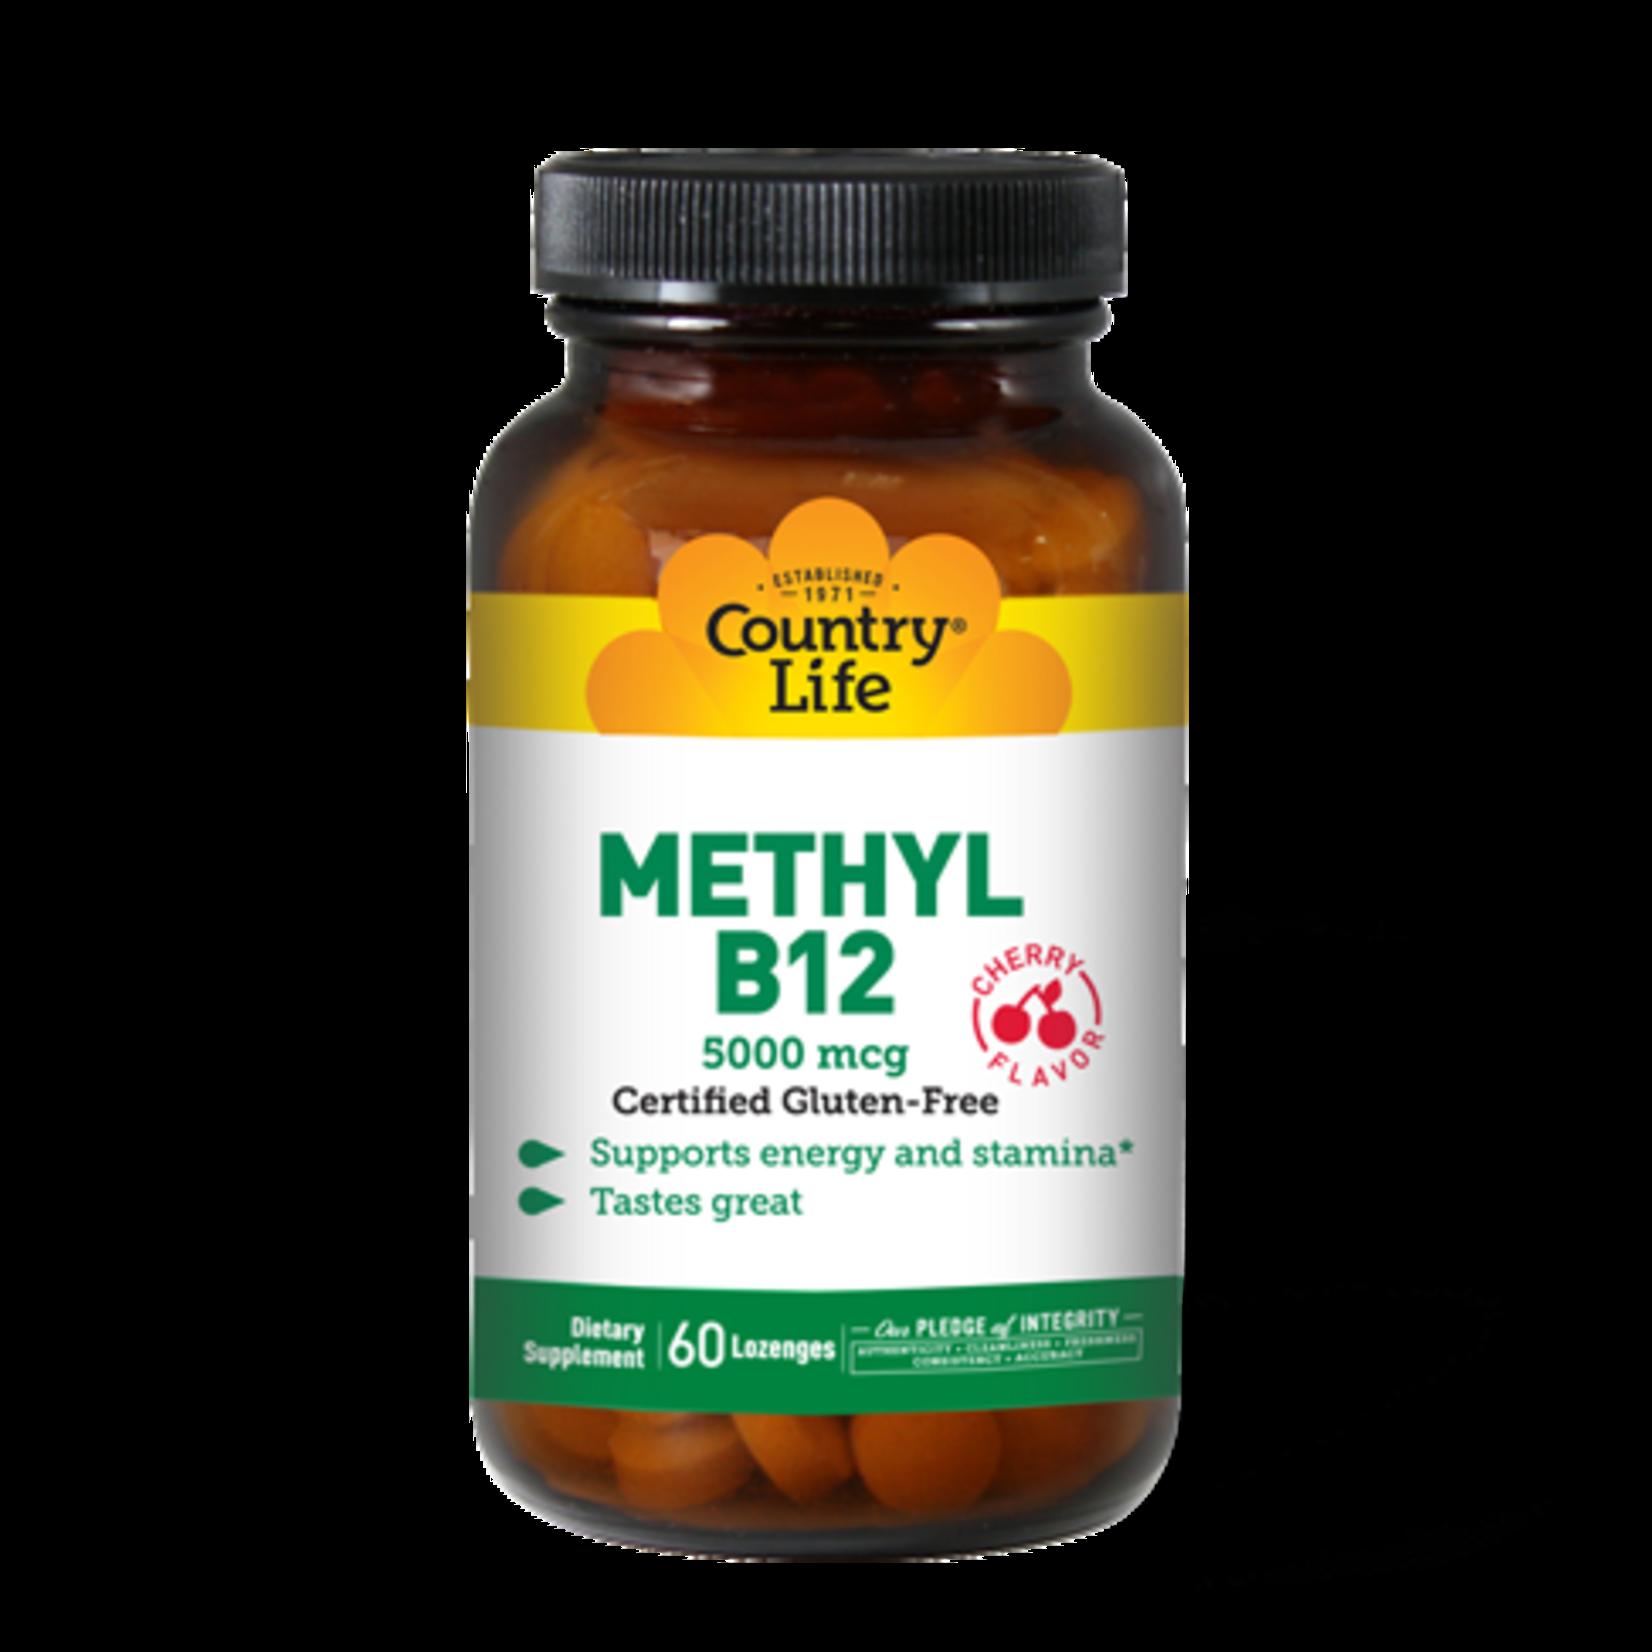 Country Life Country Life Methyl B12 5000mcg 60 Lozenges